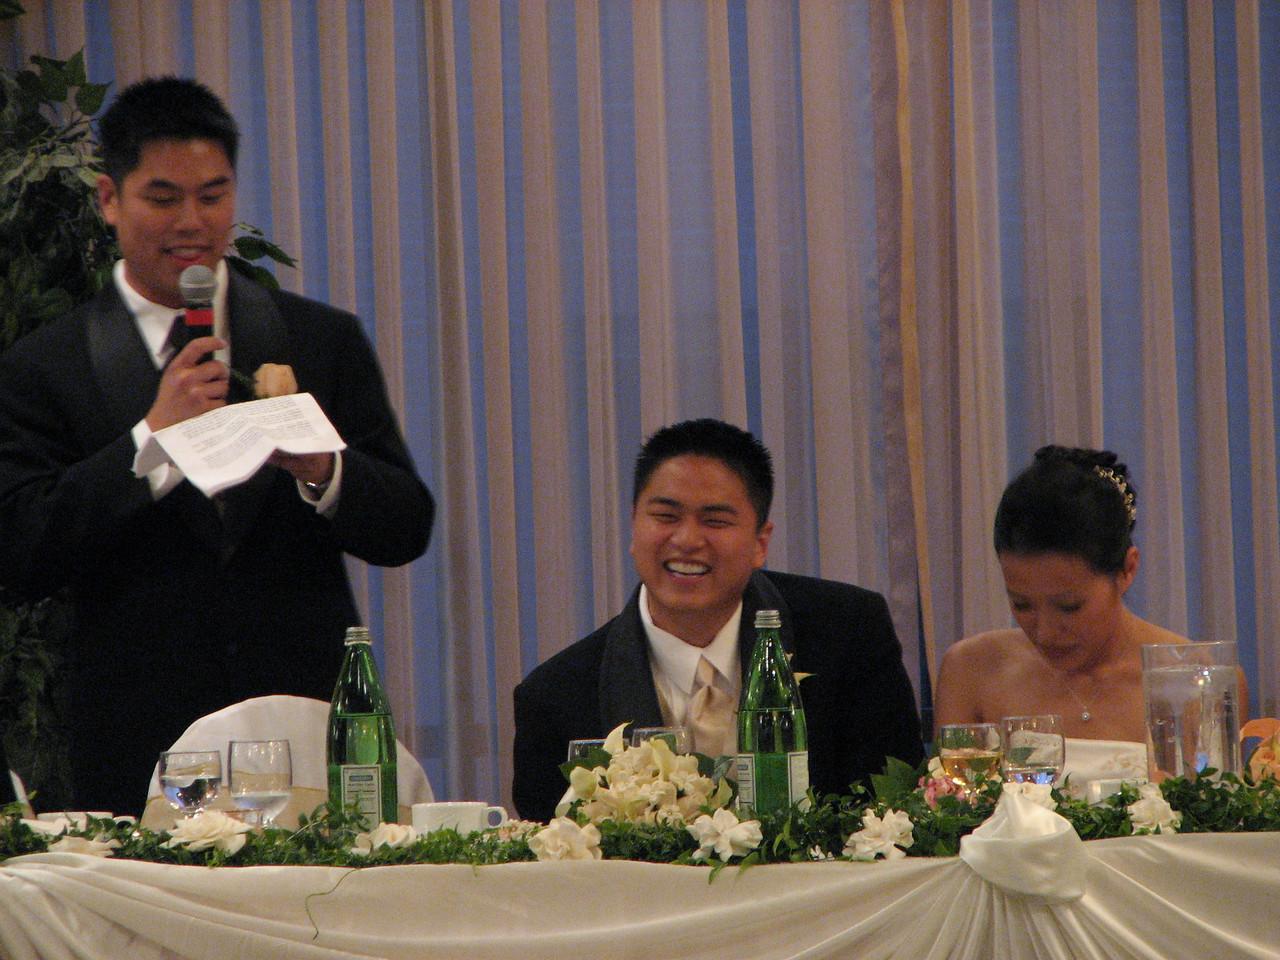 2007 06 09 Sat - Best man toast 2 - Johnny Chen, Danny & Jessica Chen